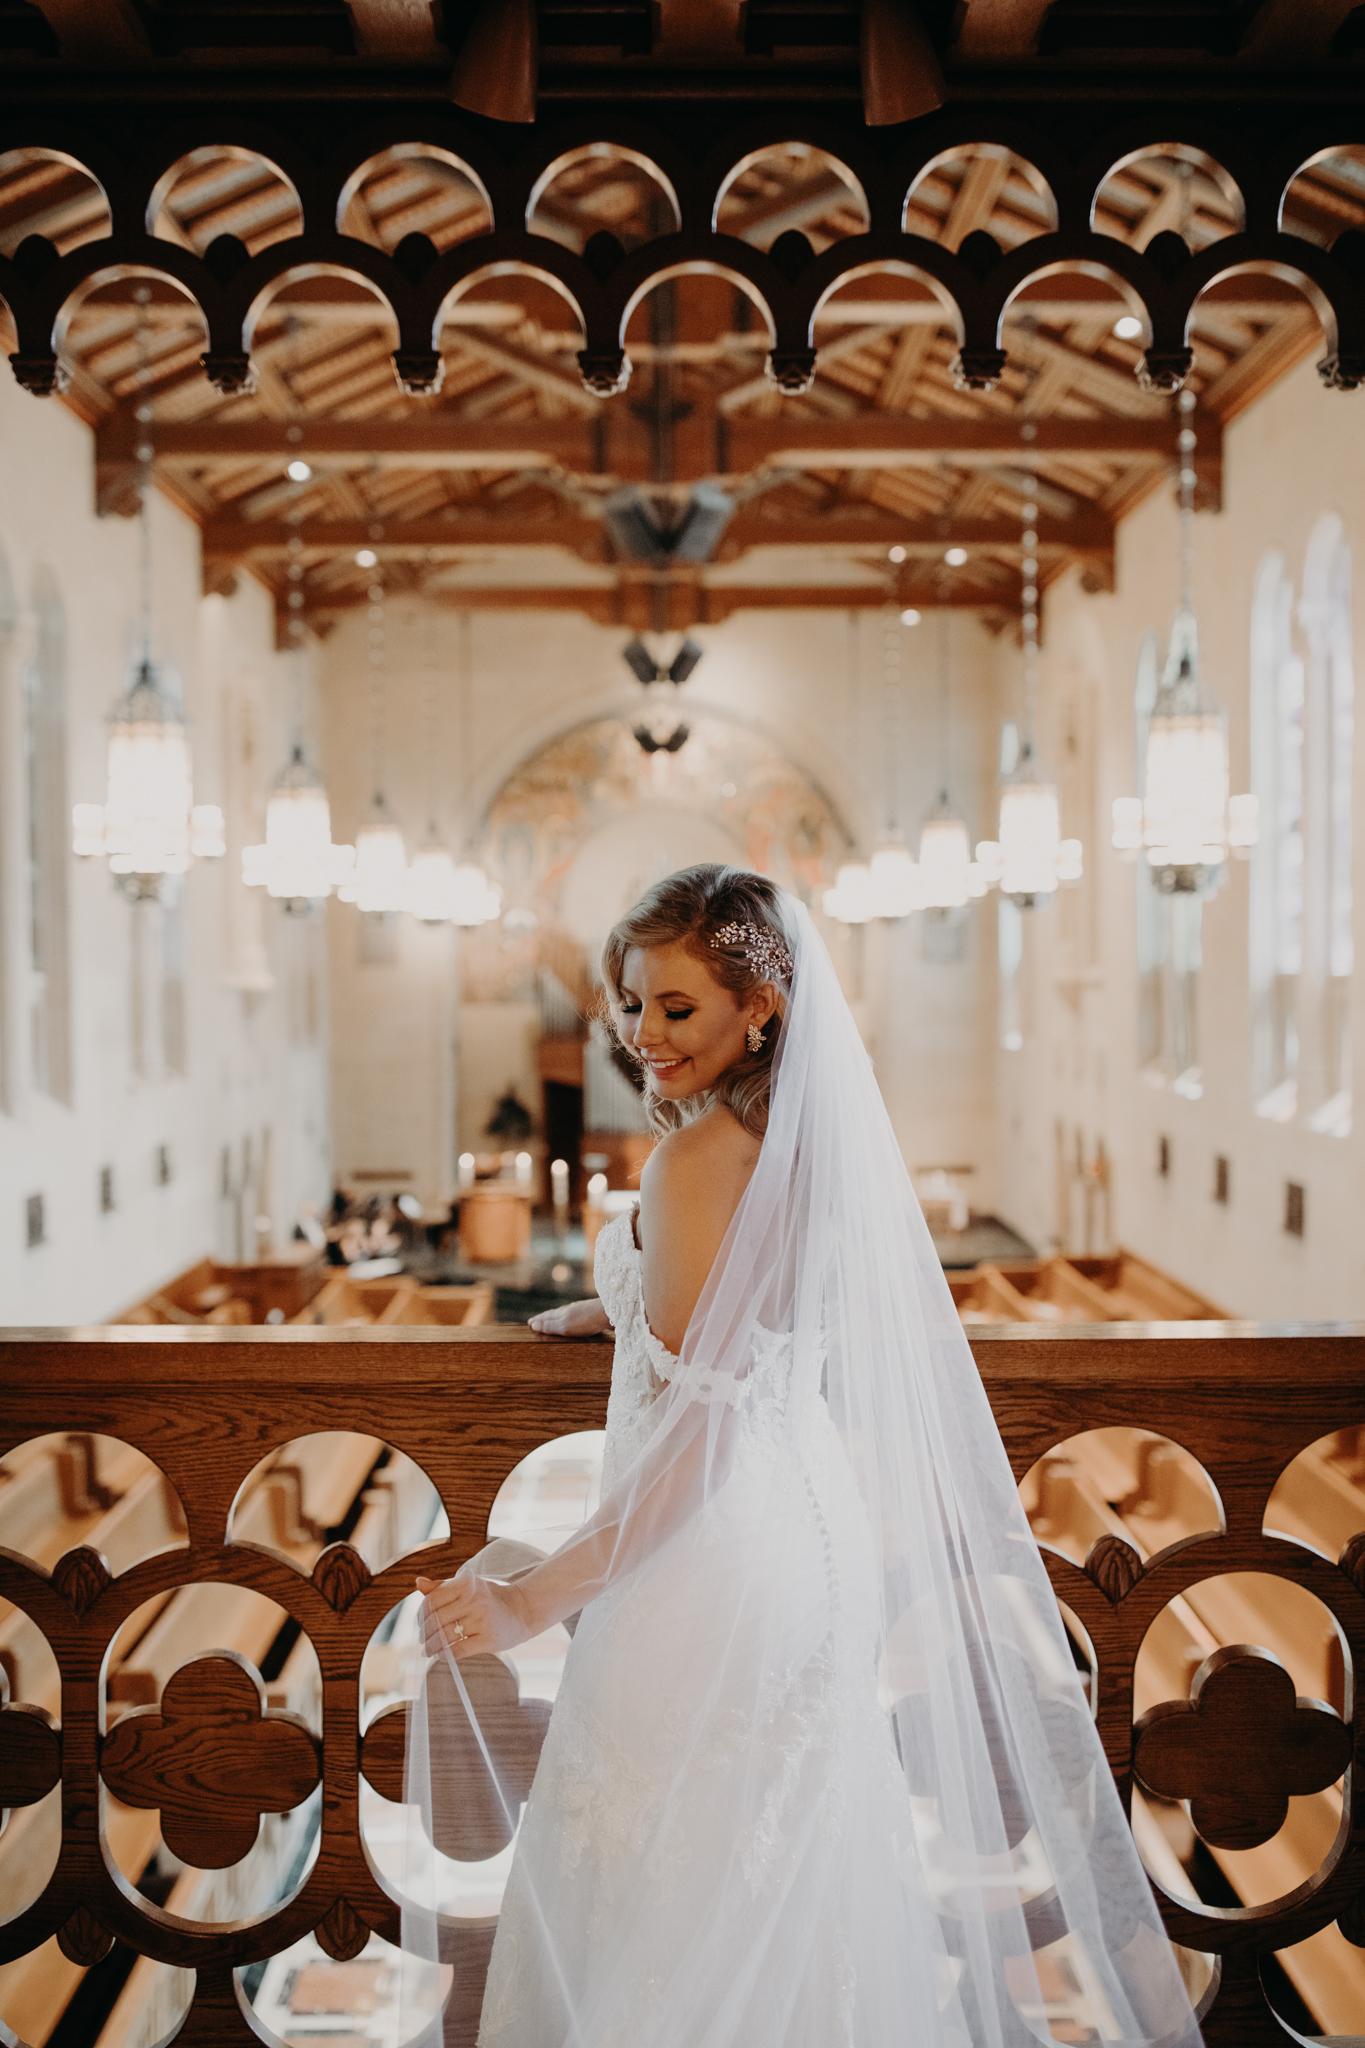 The-Inn-At-St-Johns-Wedding-34.jpg